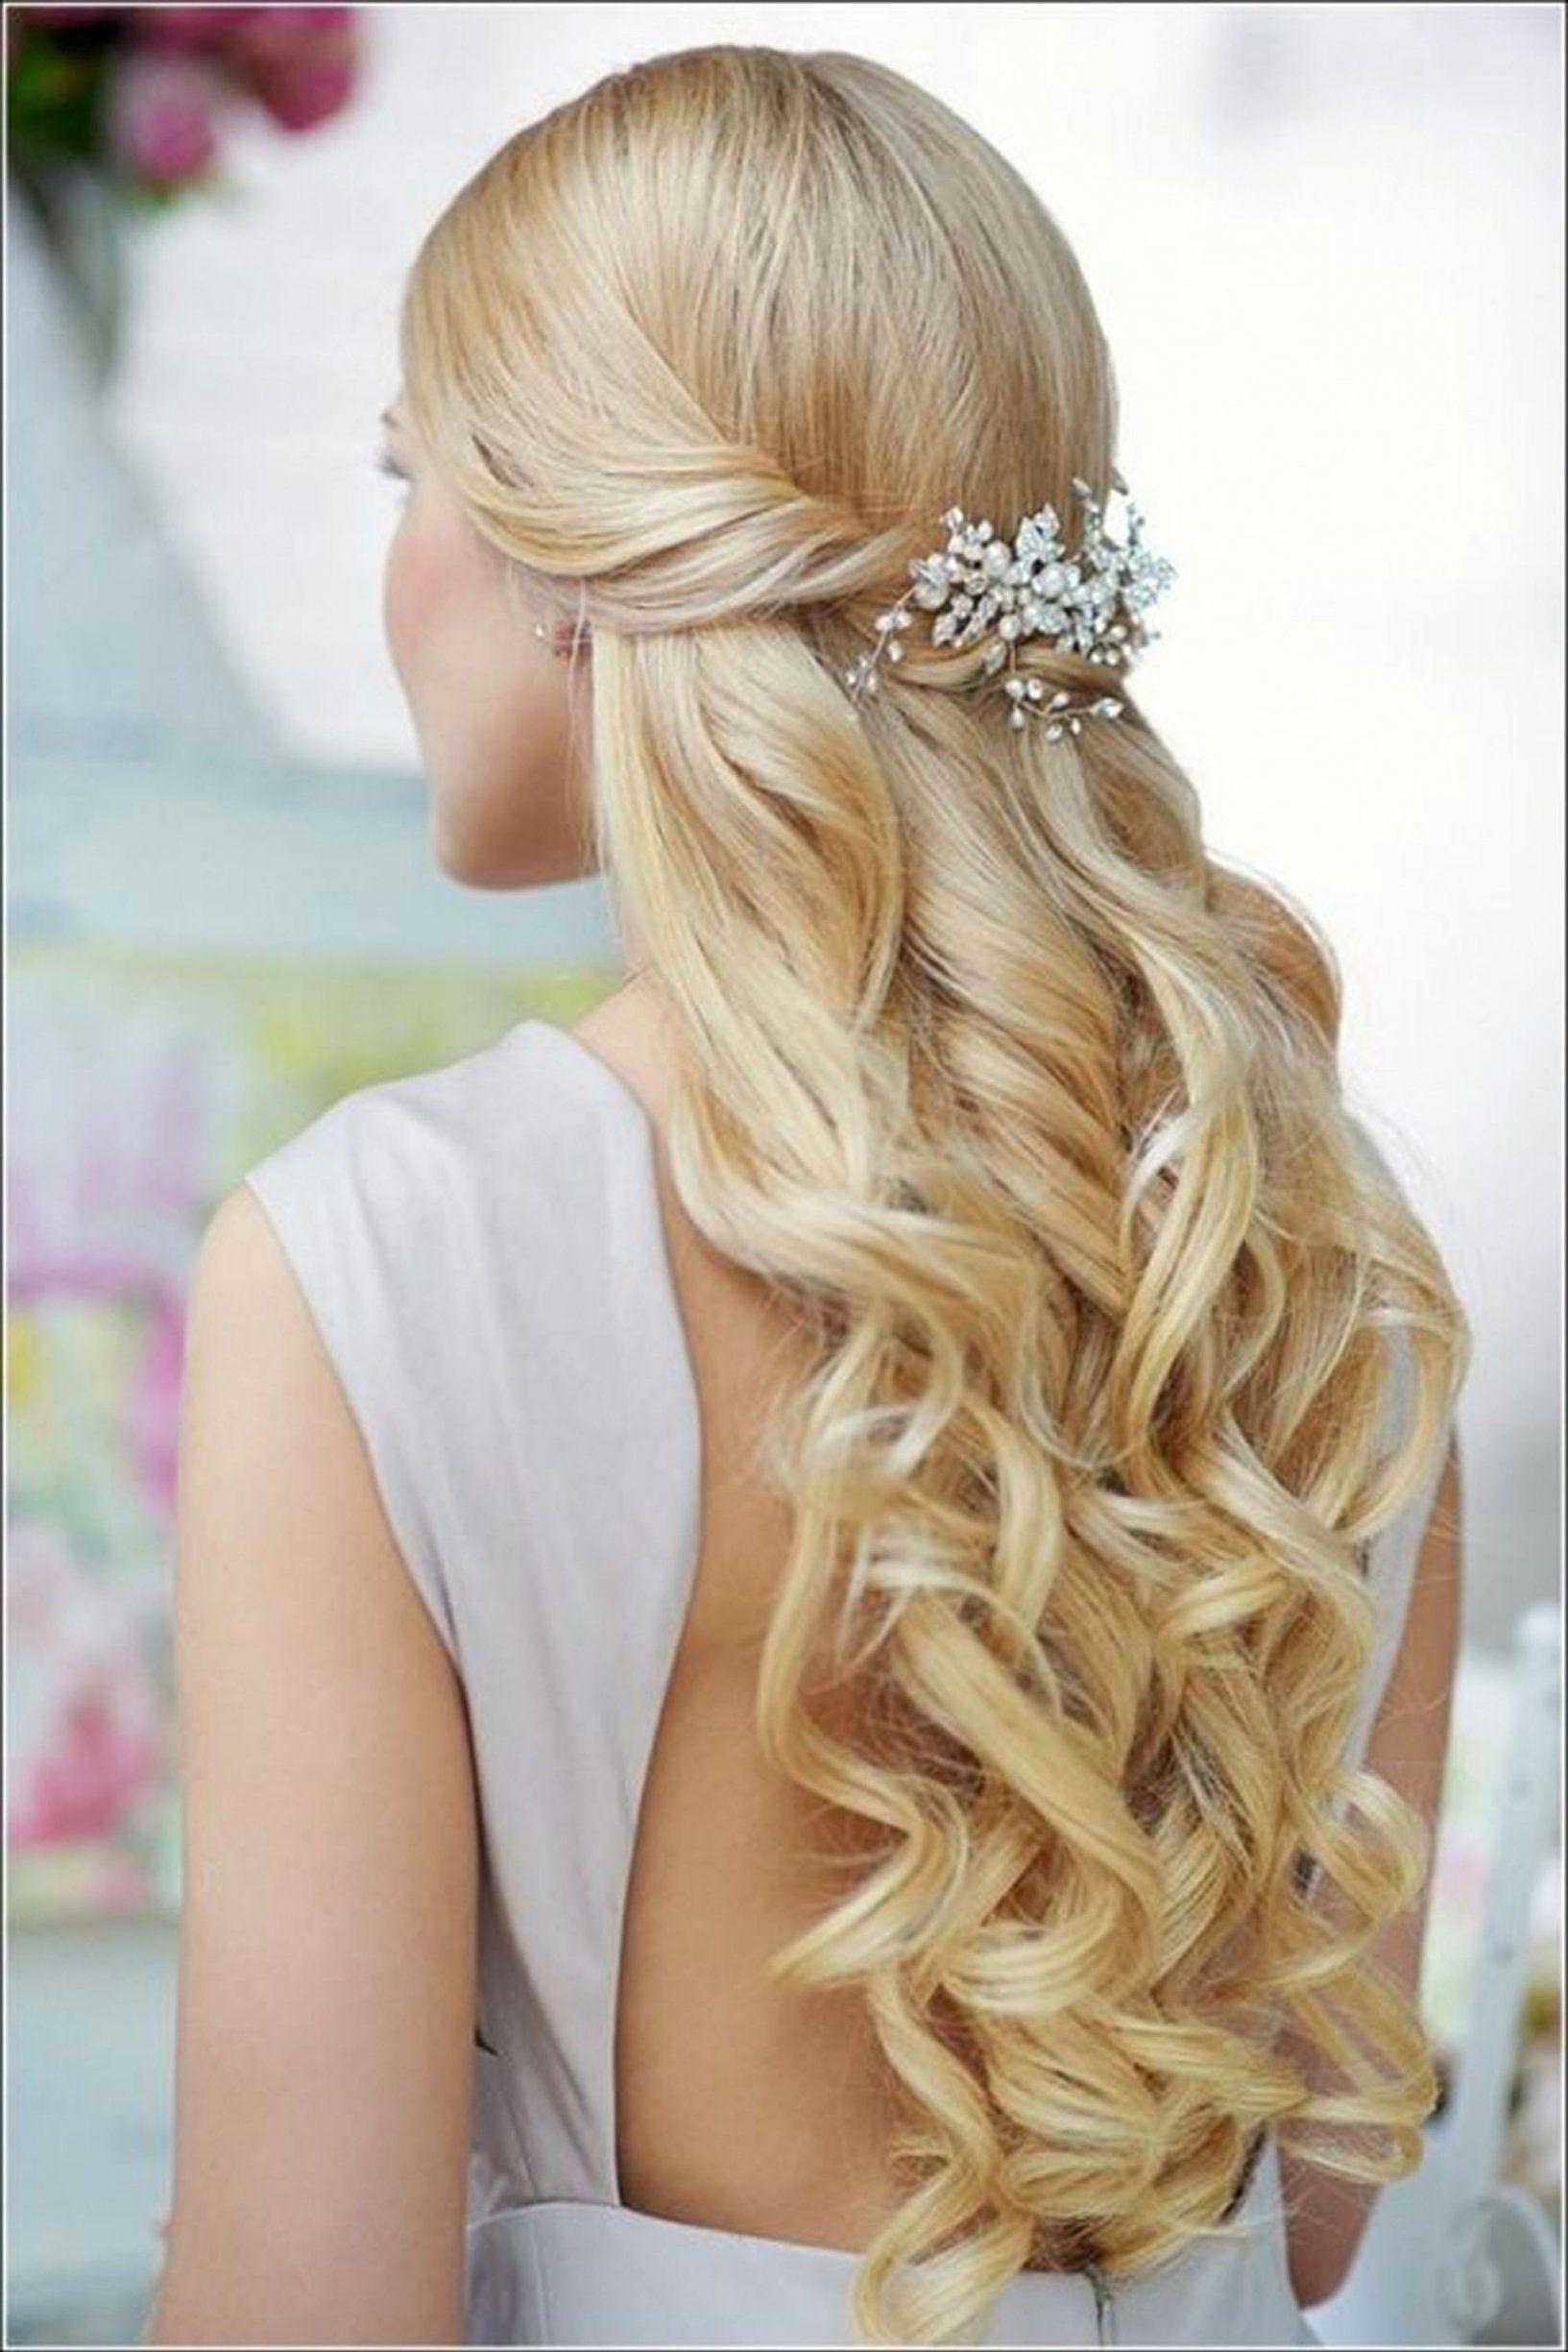 simple wedding hairstyles for long hair   Hair styles, Wedding ...